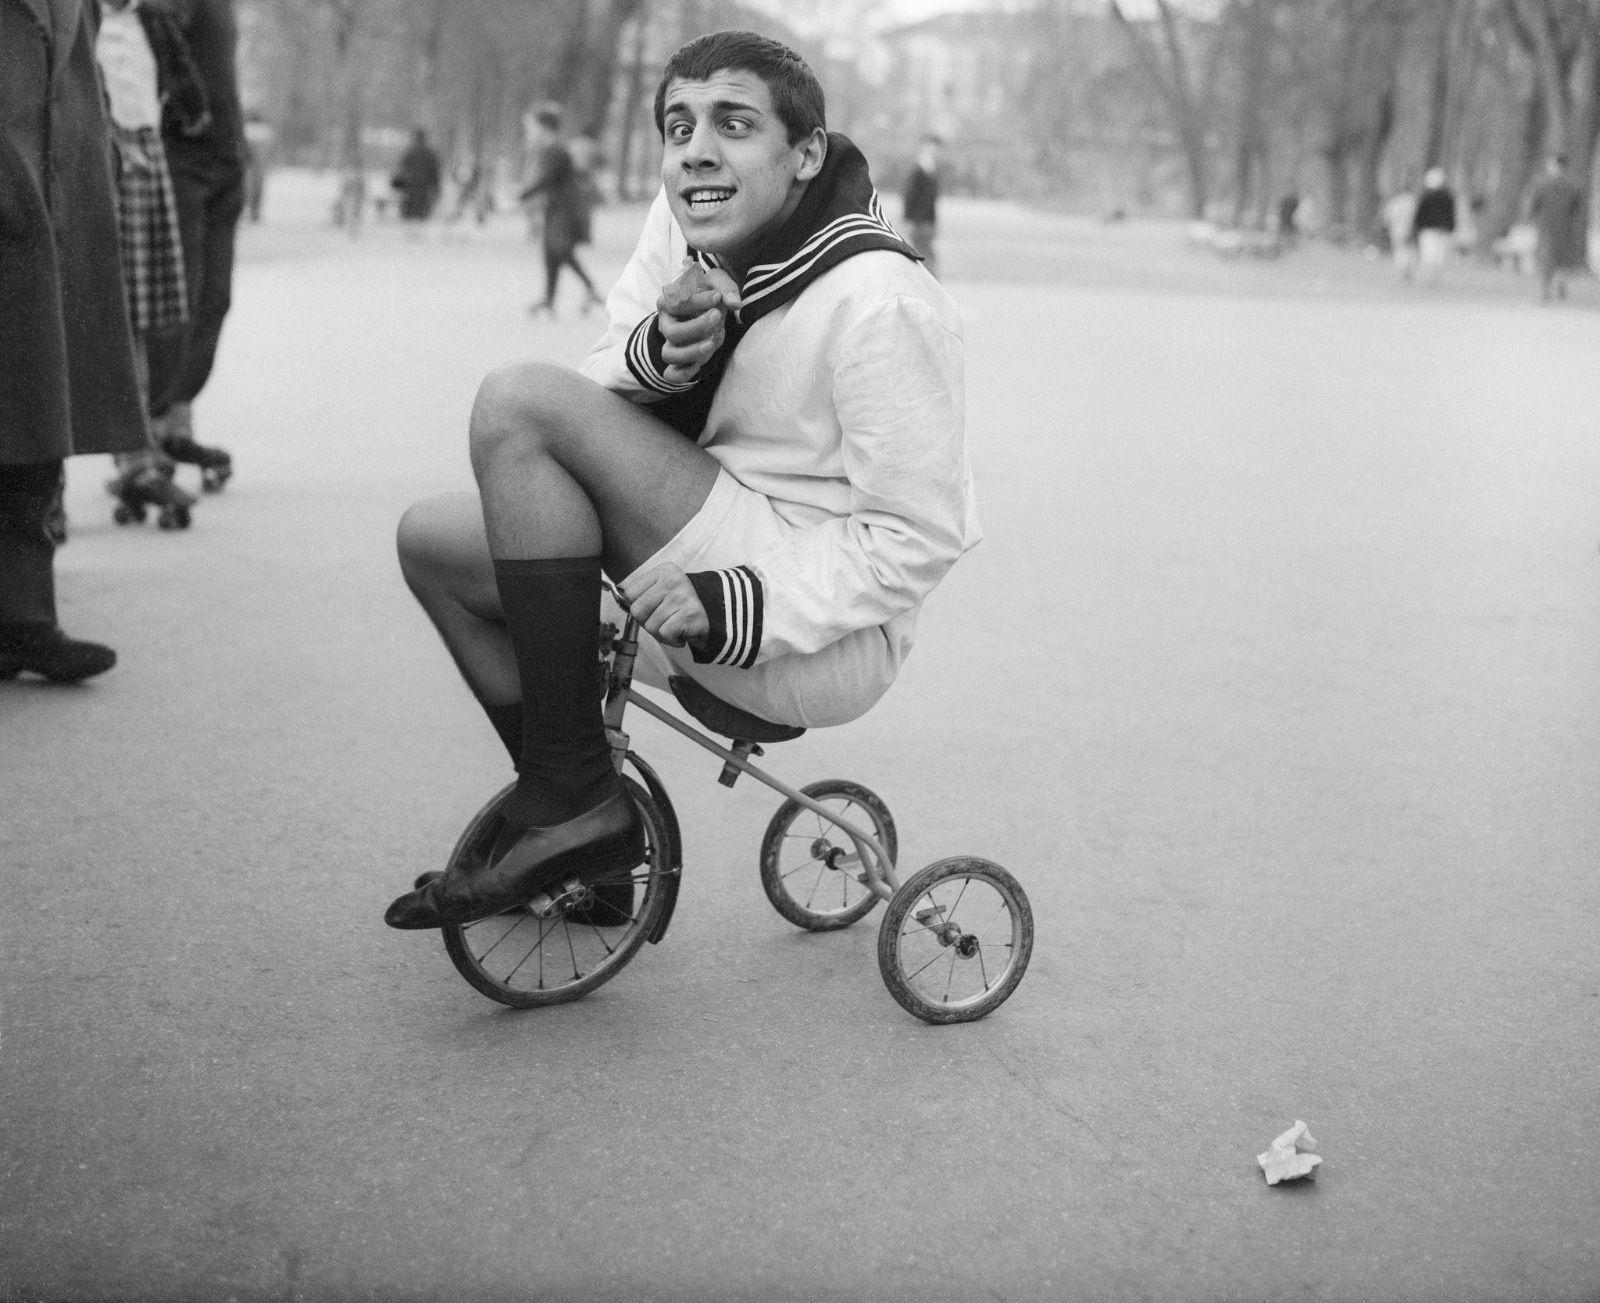 Adriano Celentano Imitating Jerry Lewis 1956 By Otto Bettmann